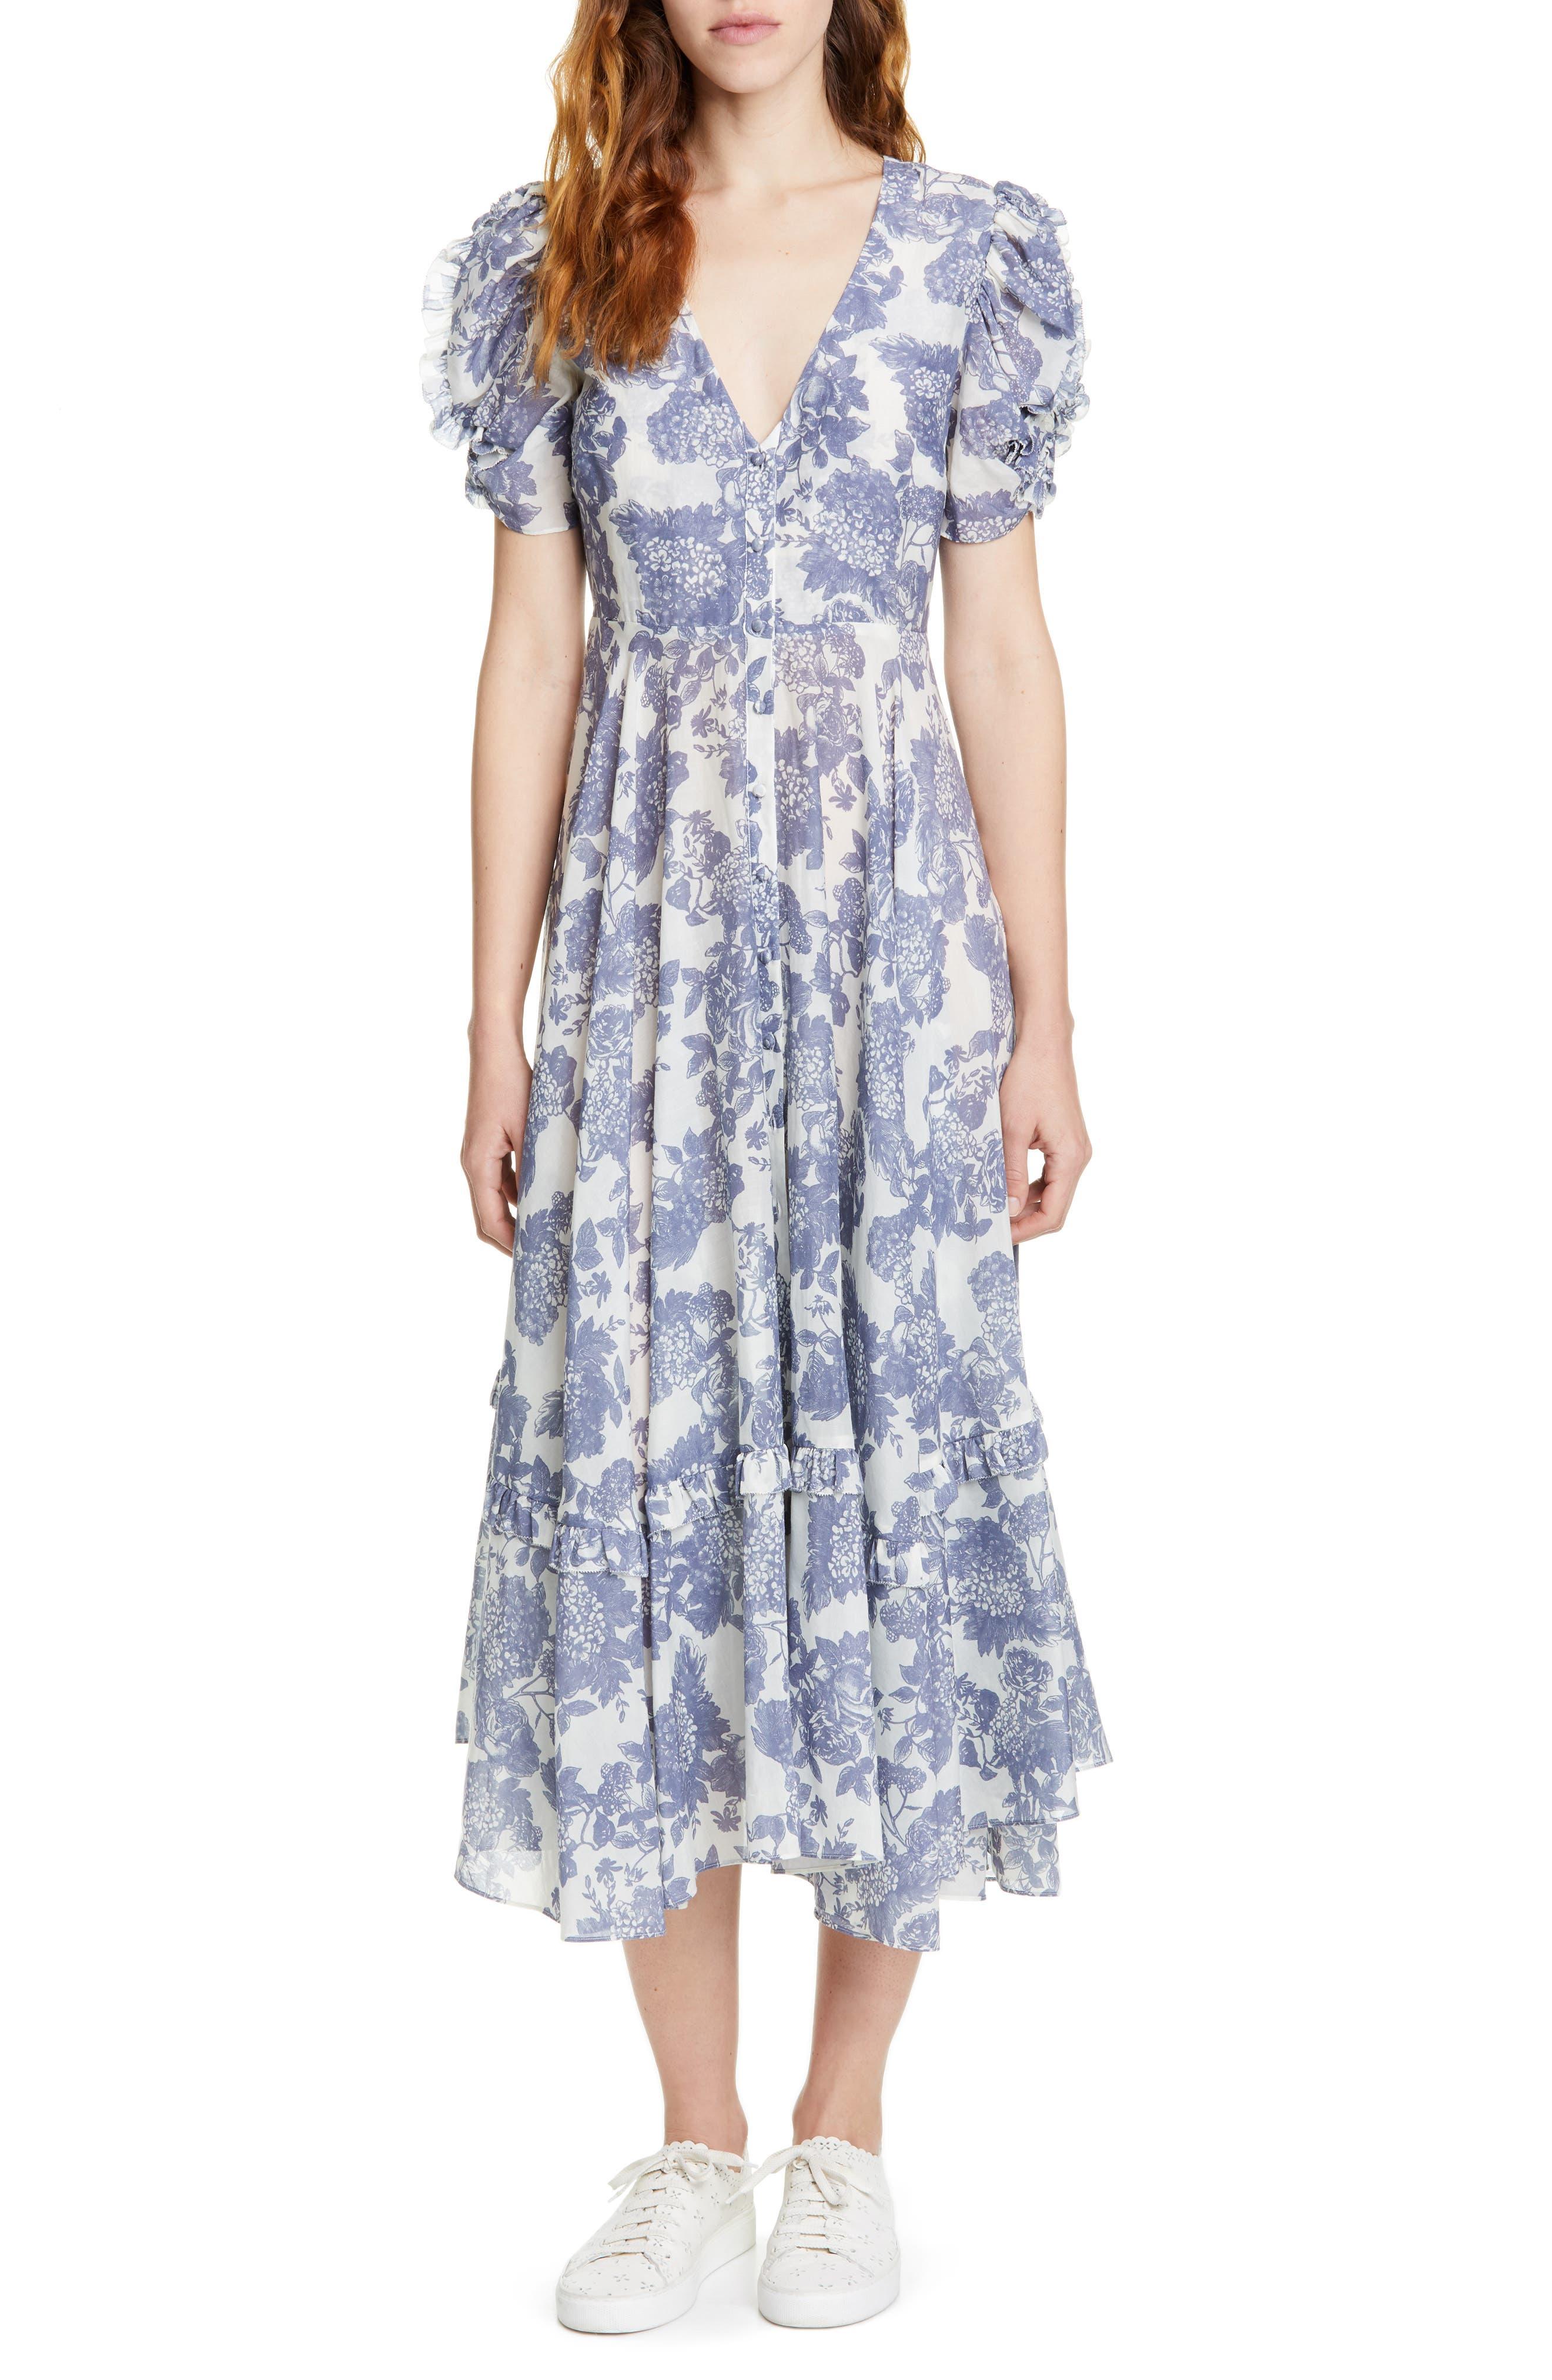 Loveshackfancy Andie Floral Cotton & Silk Midi Dress, Grey